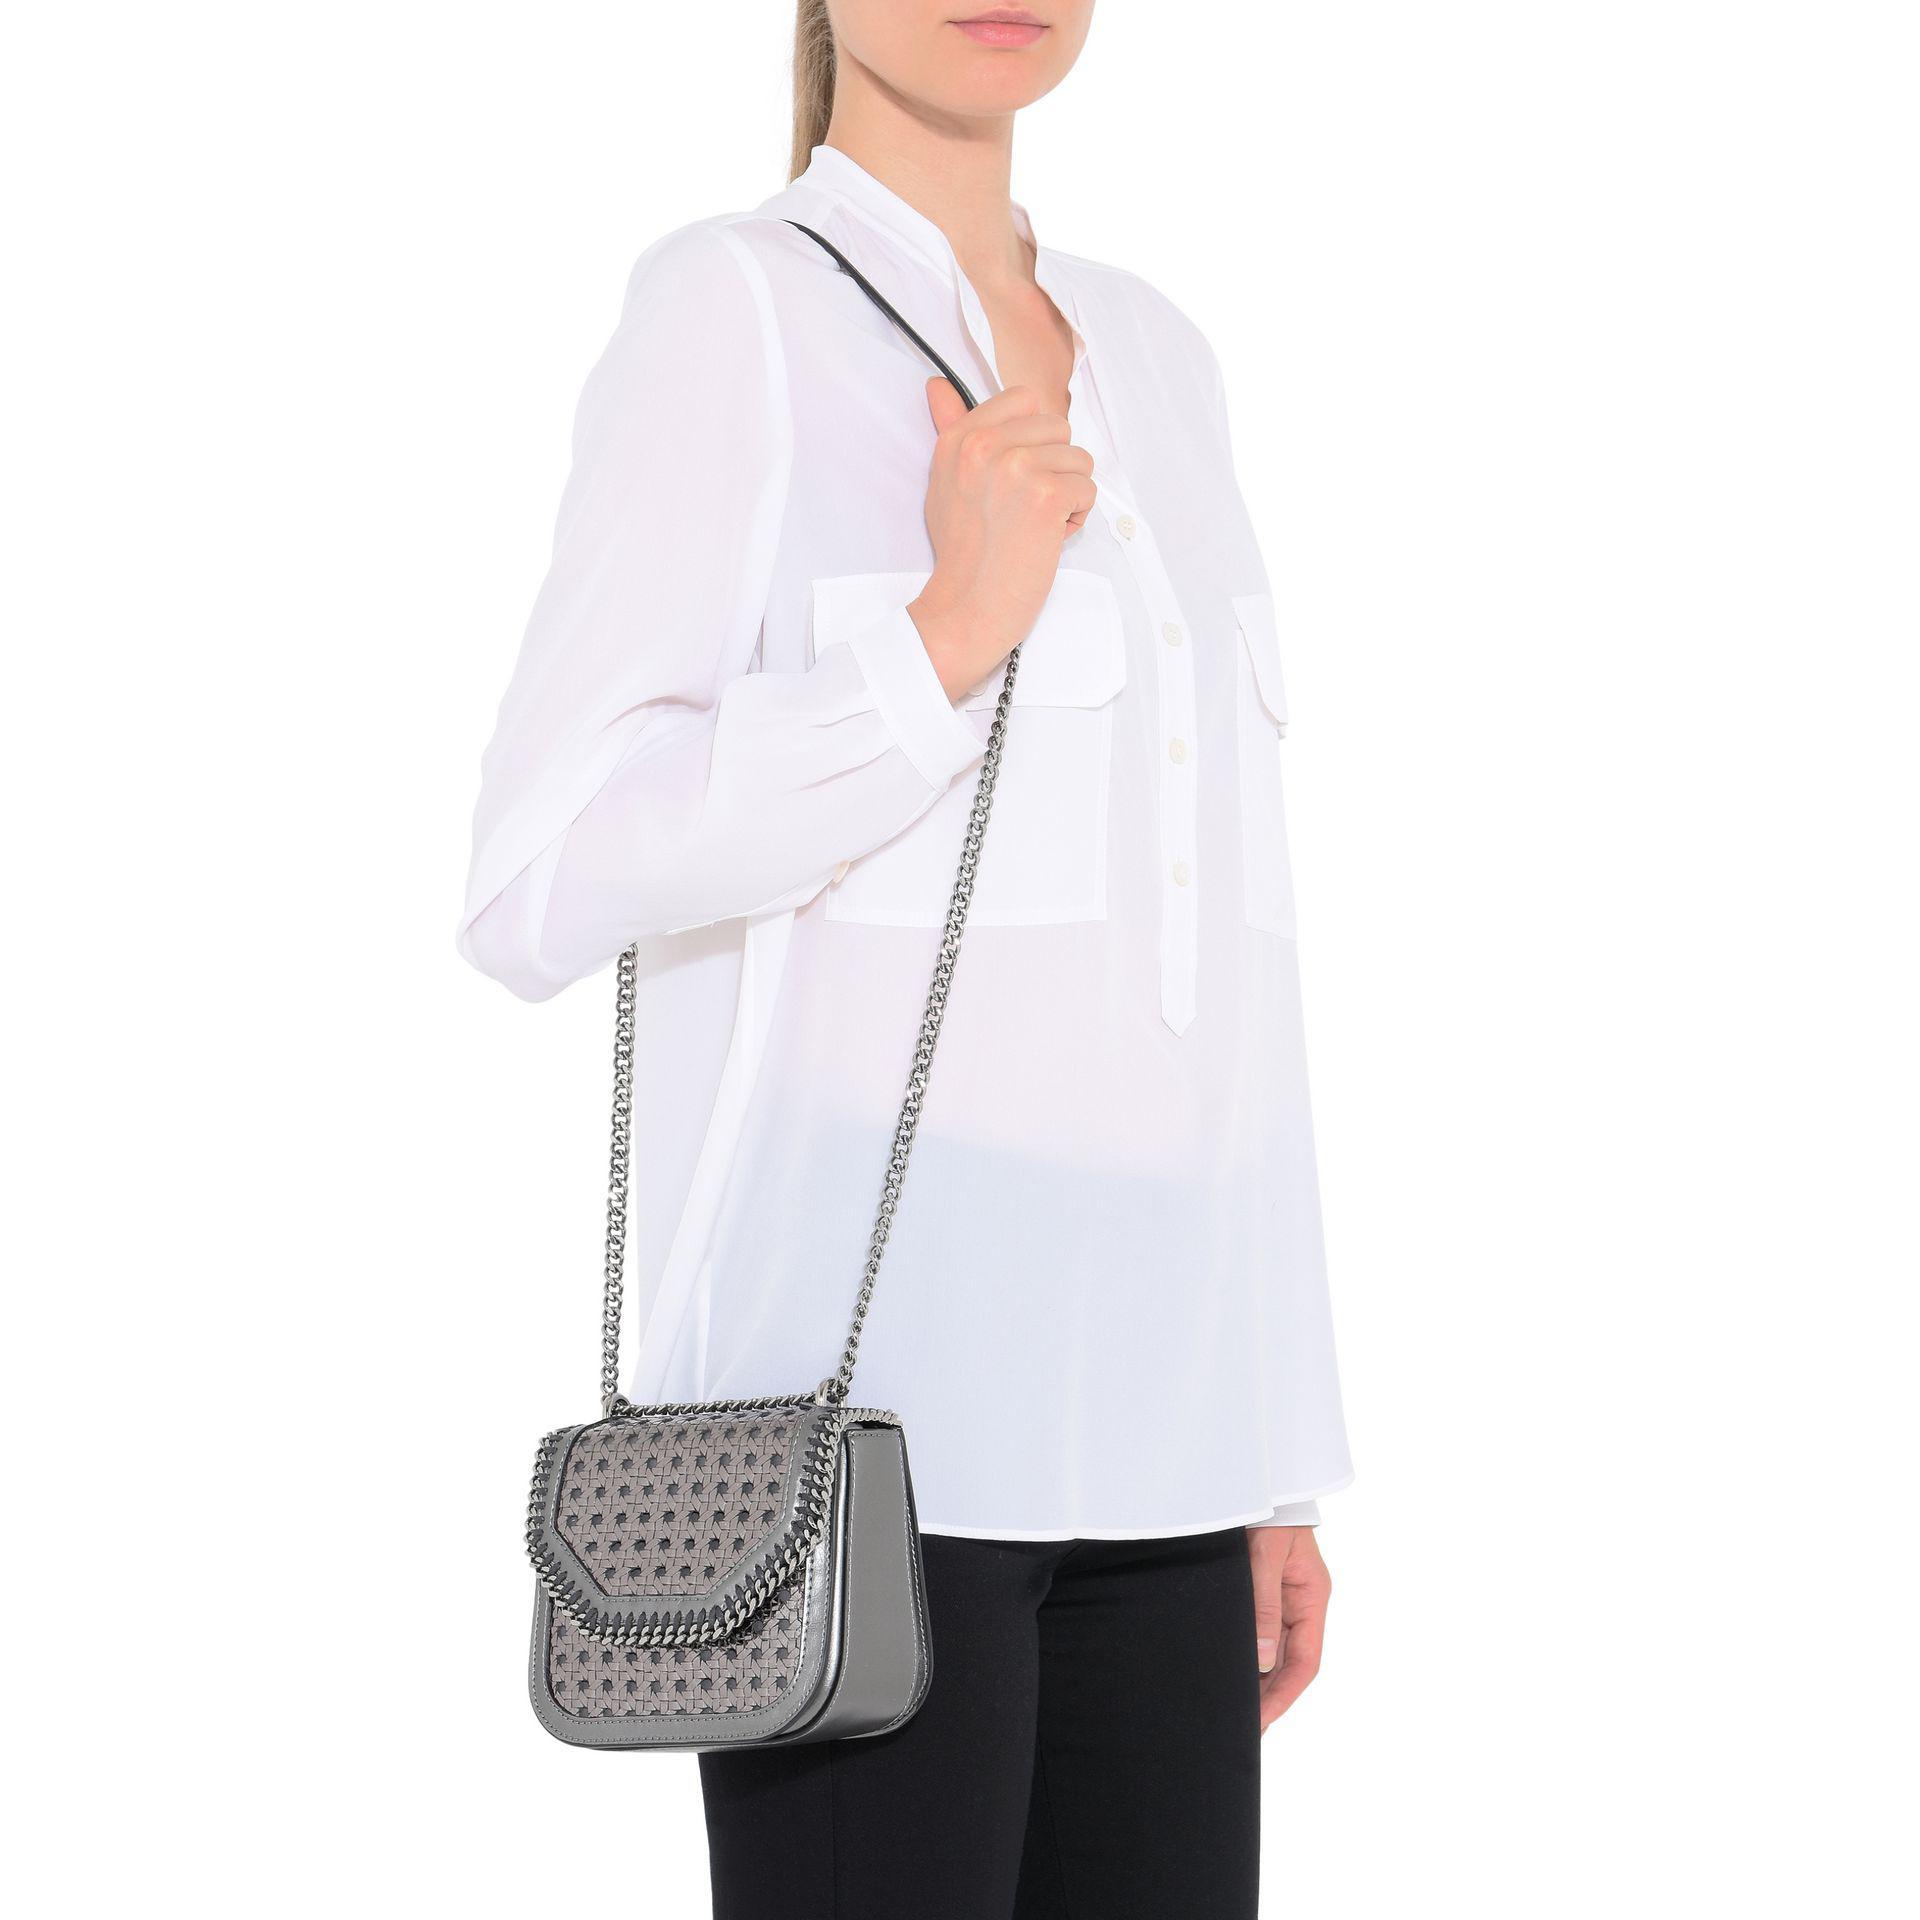 4363af96b3e4 Lyst - Stella McCartney Metallic Falabella Box Wicker Mini Shoulder Bag